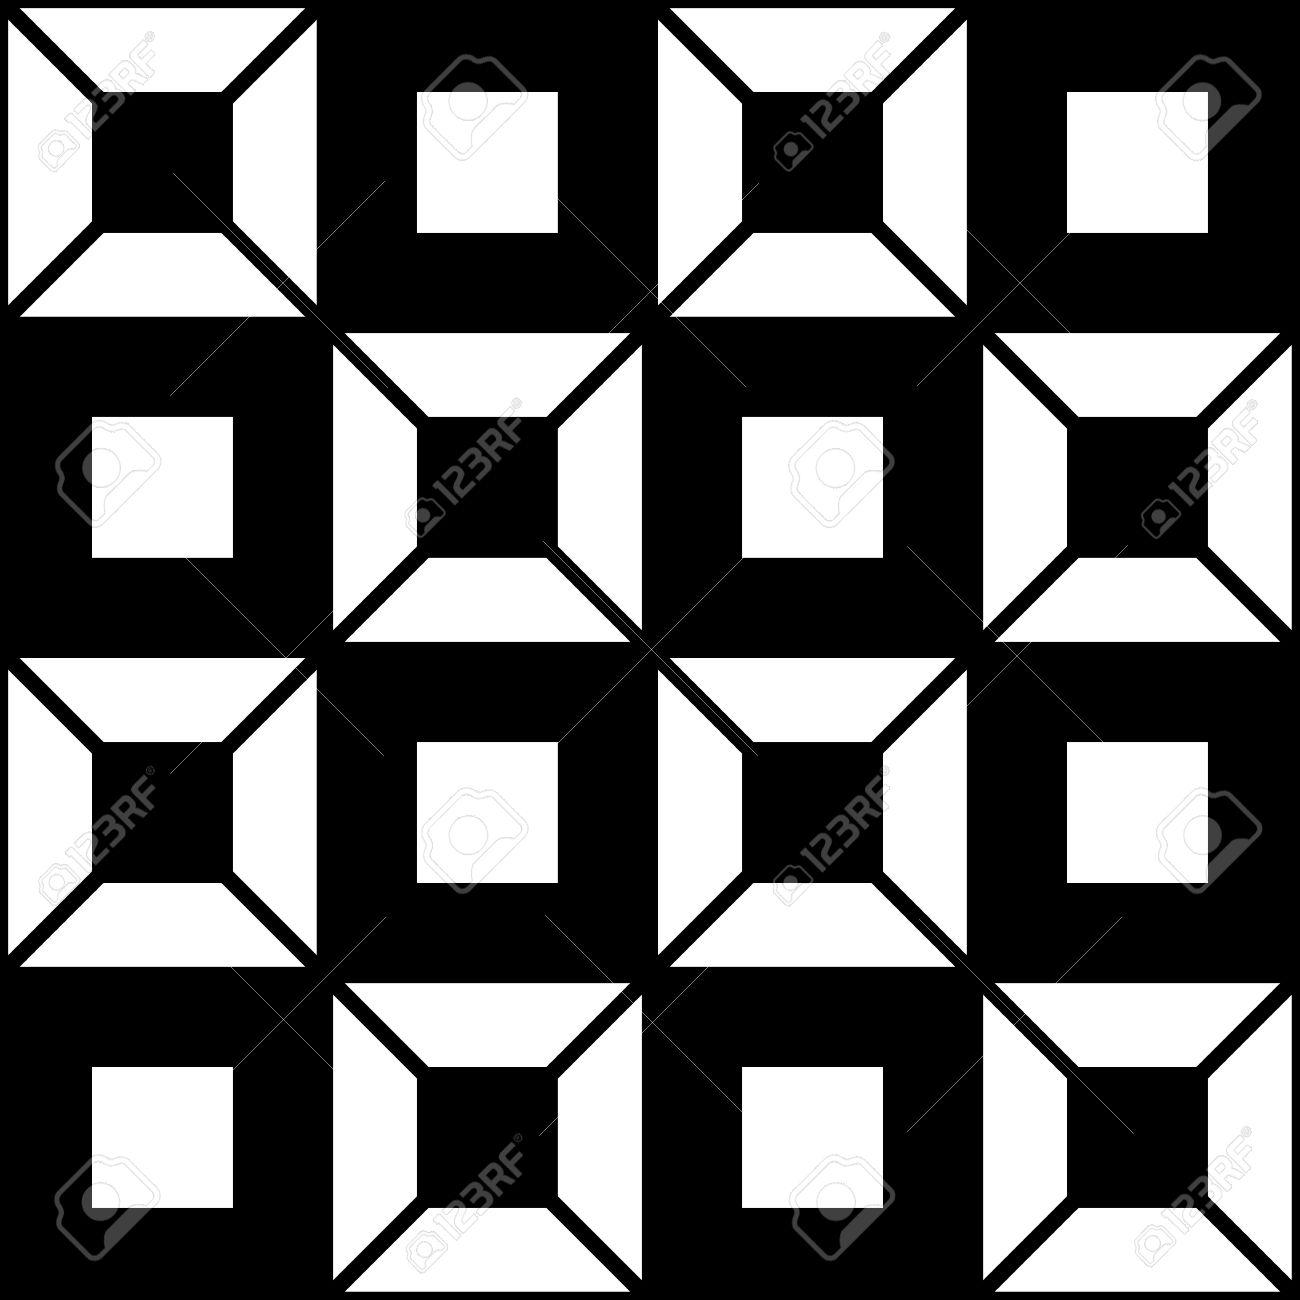 a geometric monochromatic chessboard seamless patterns made of